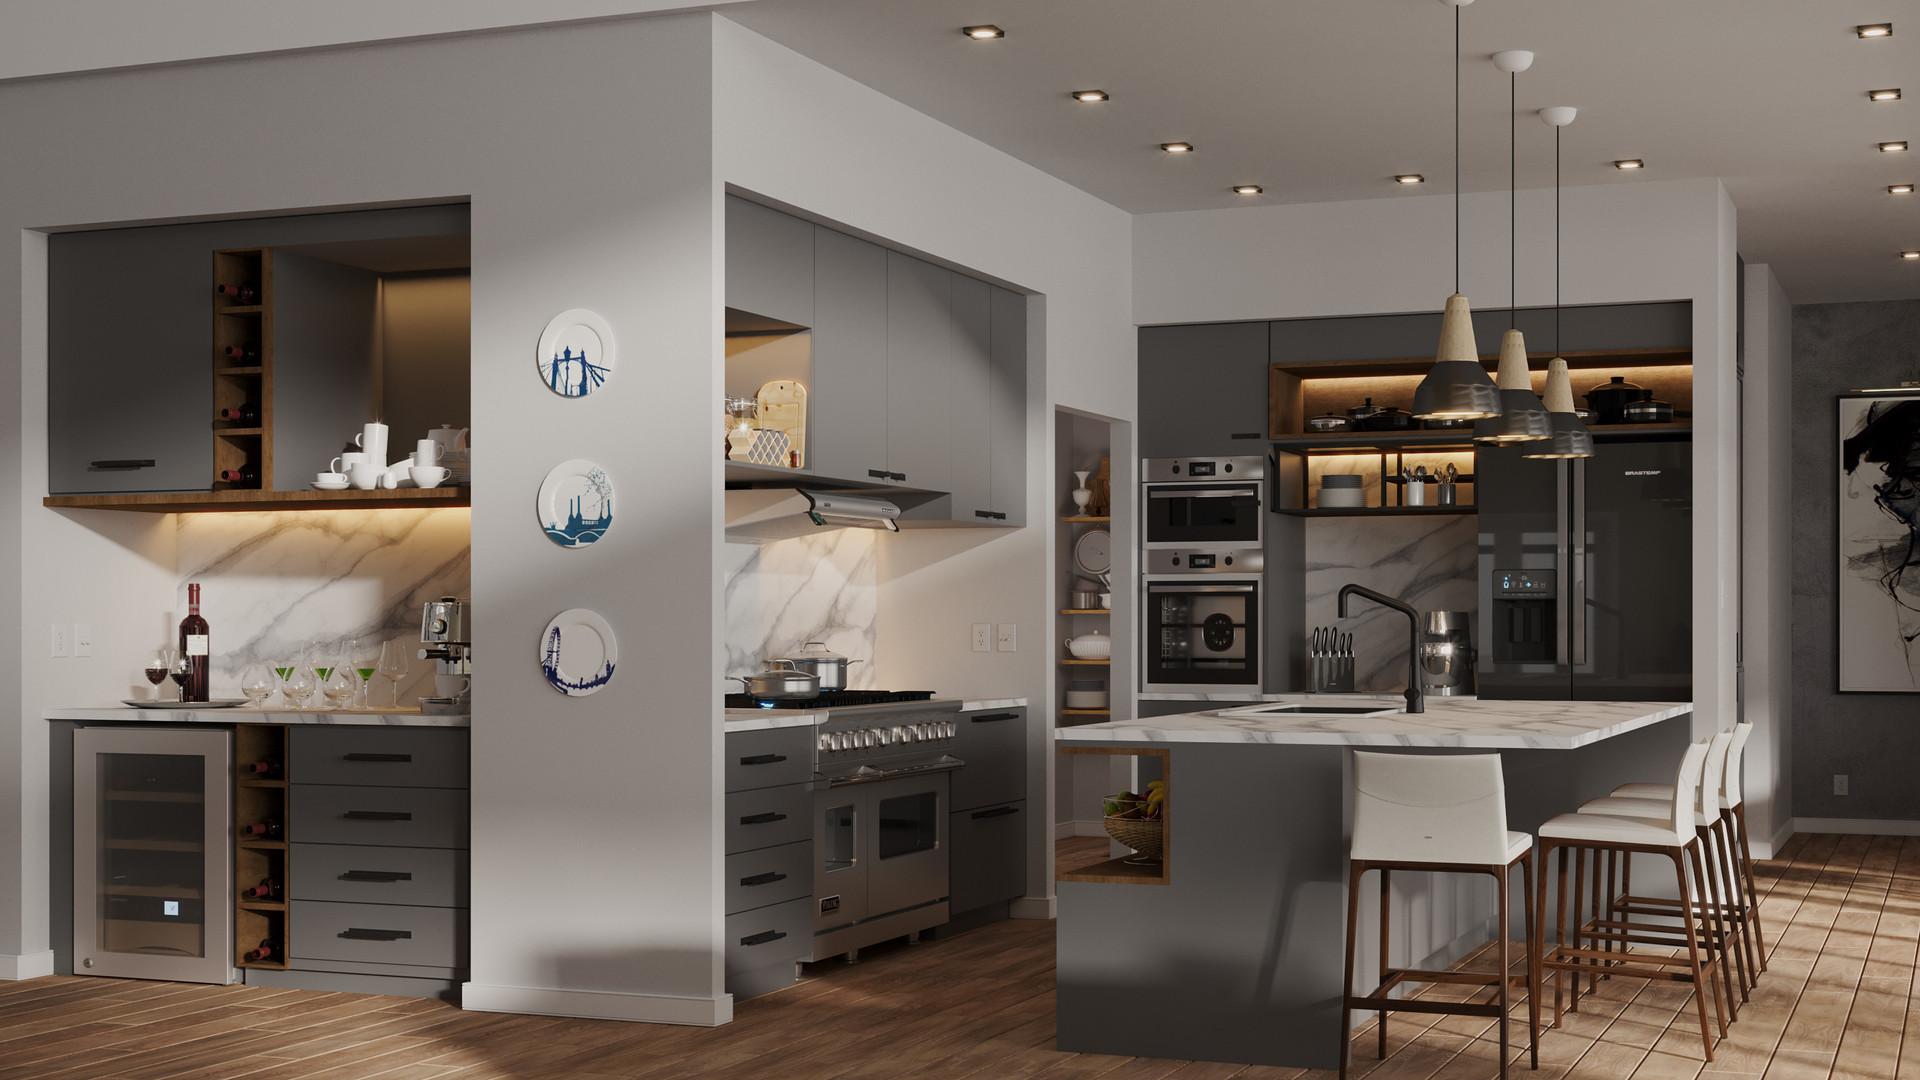 DesignStone - Waterleaf Home Design